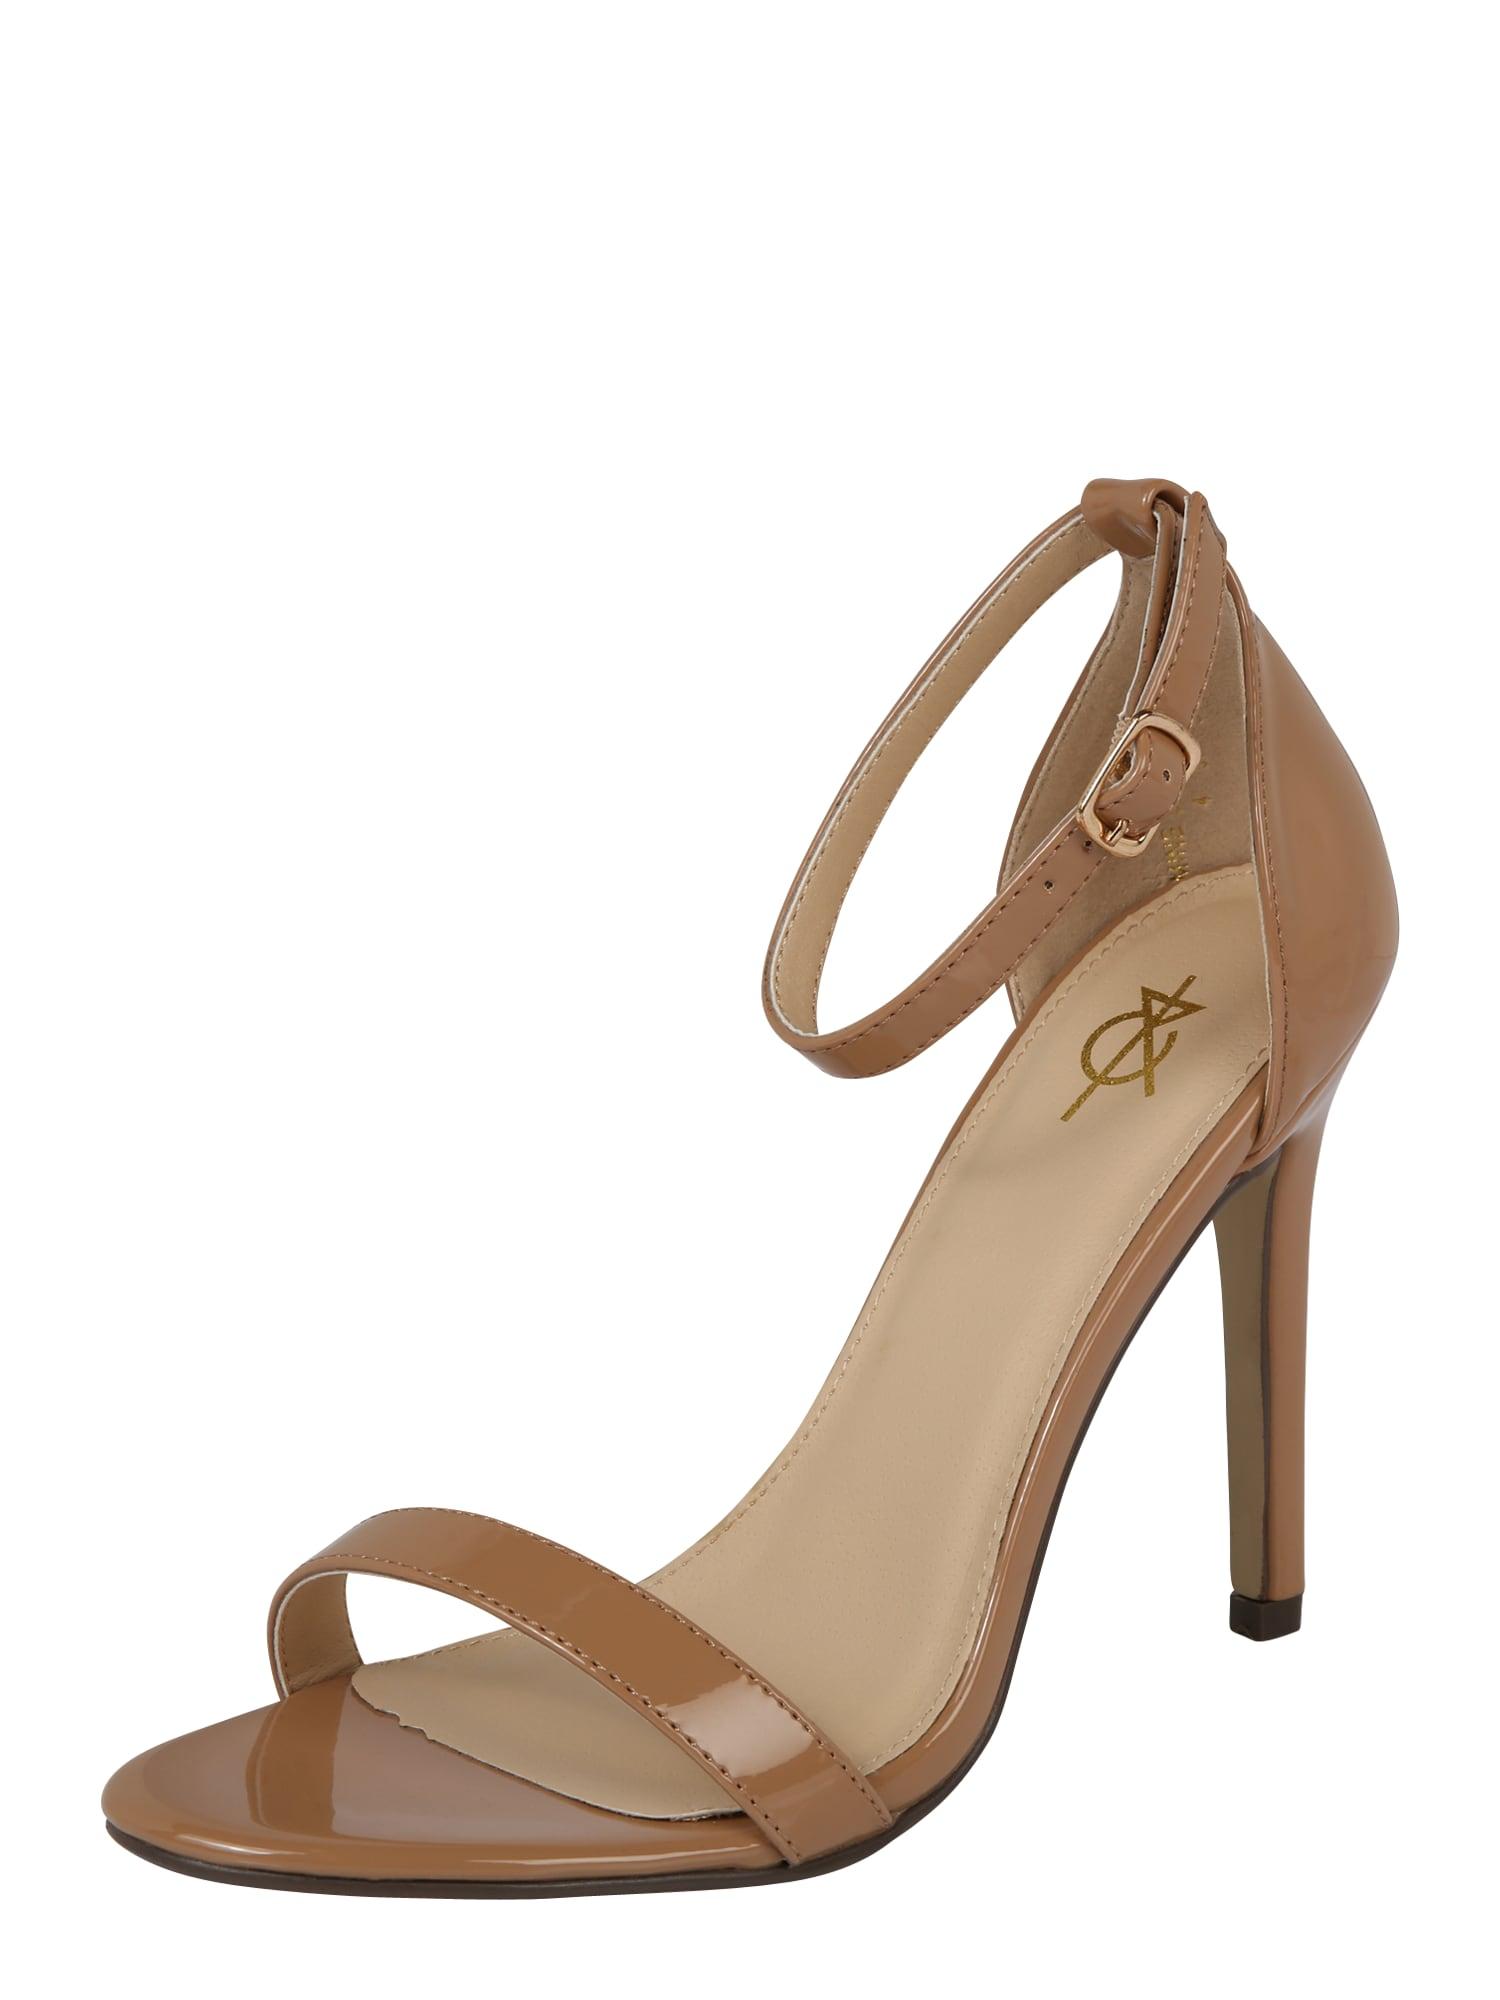 Páskové sandály JASMINE velbloudí 4th & Reckless